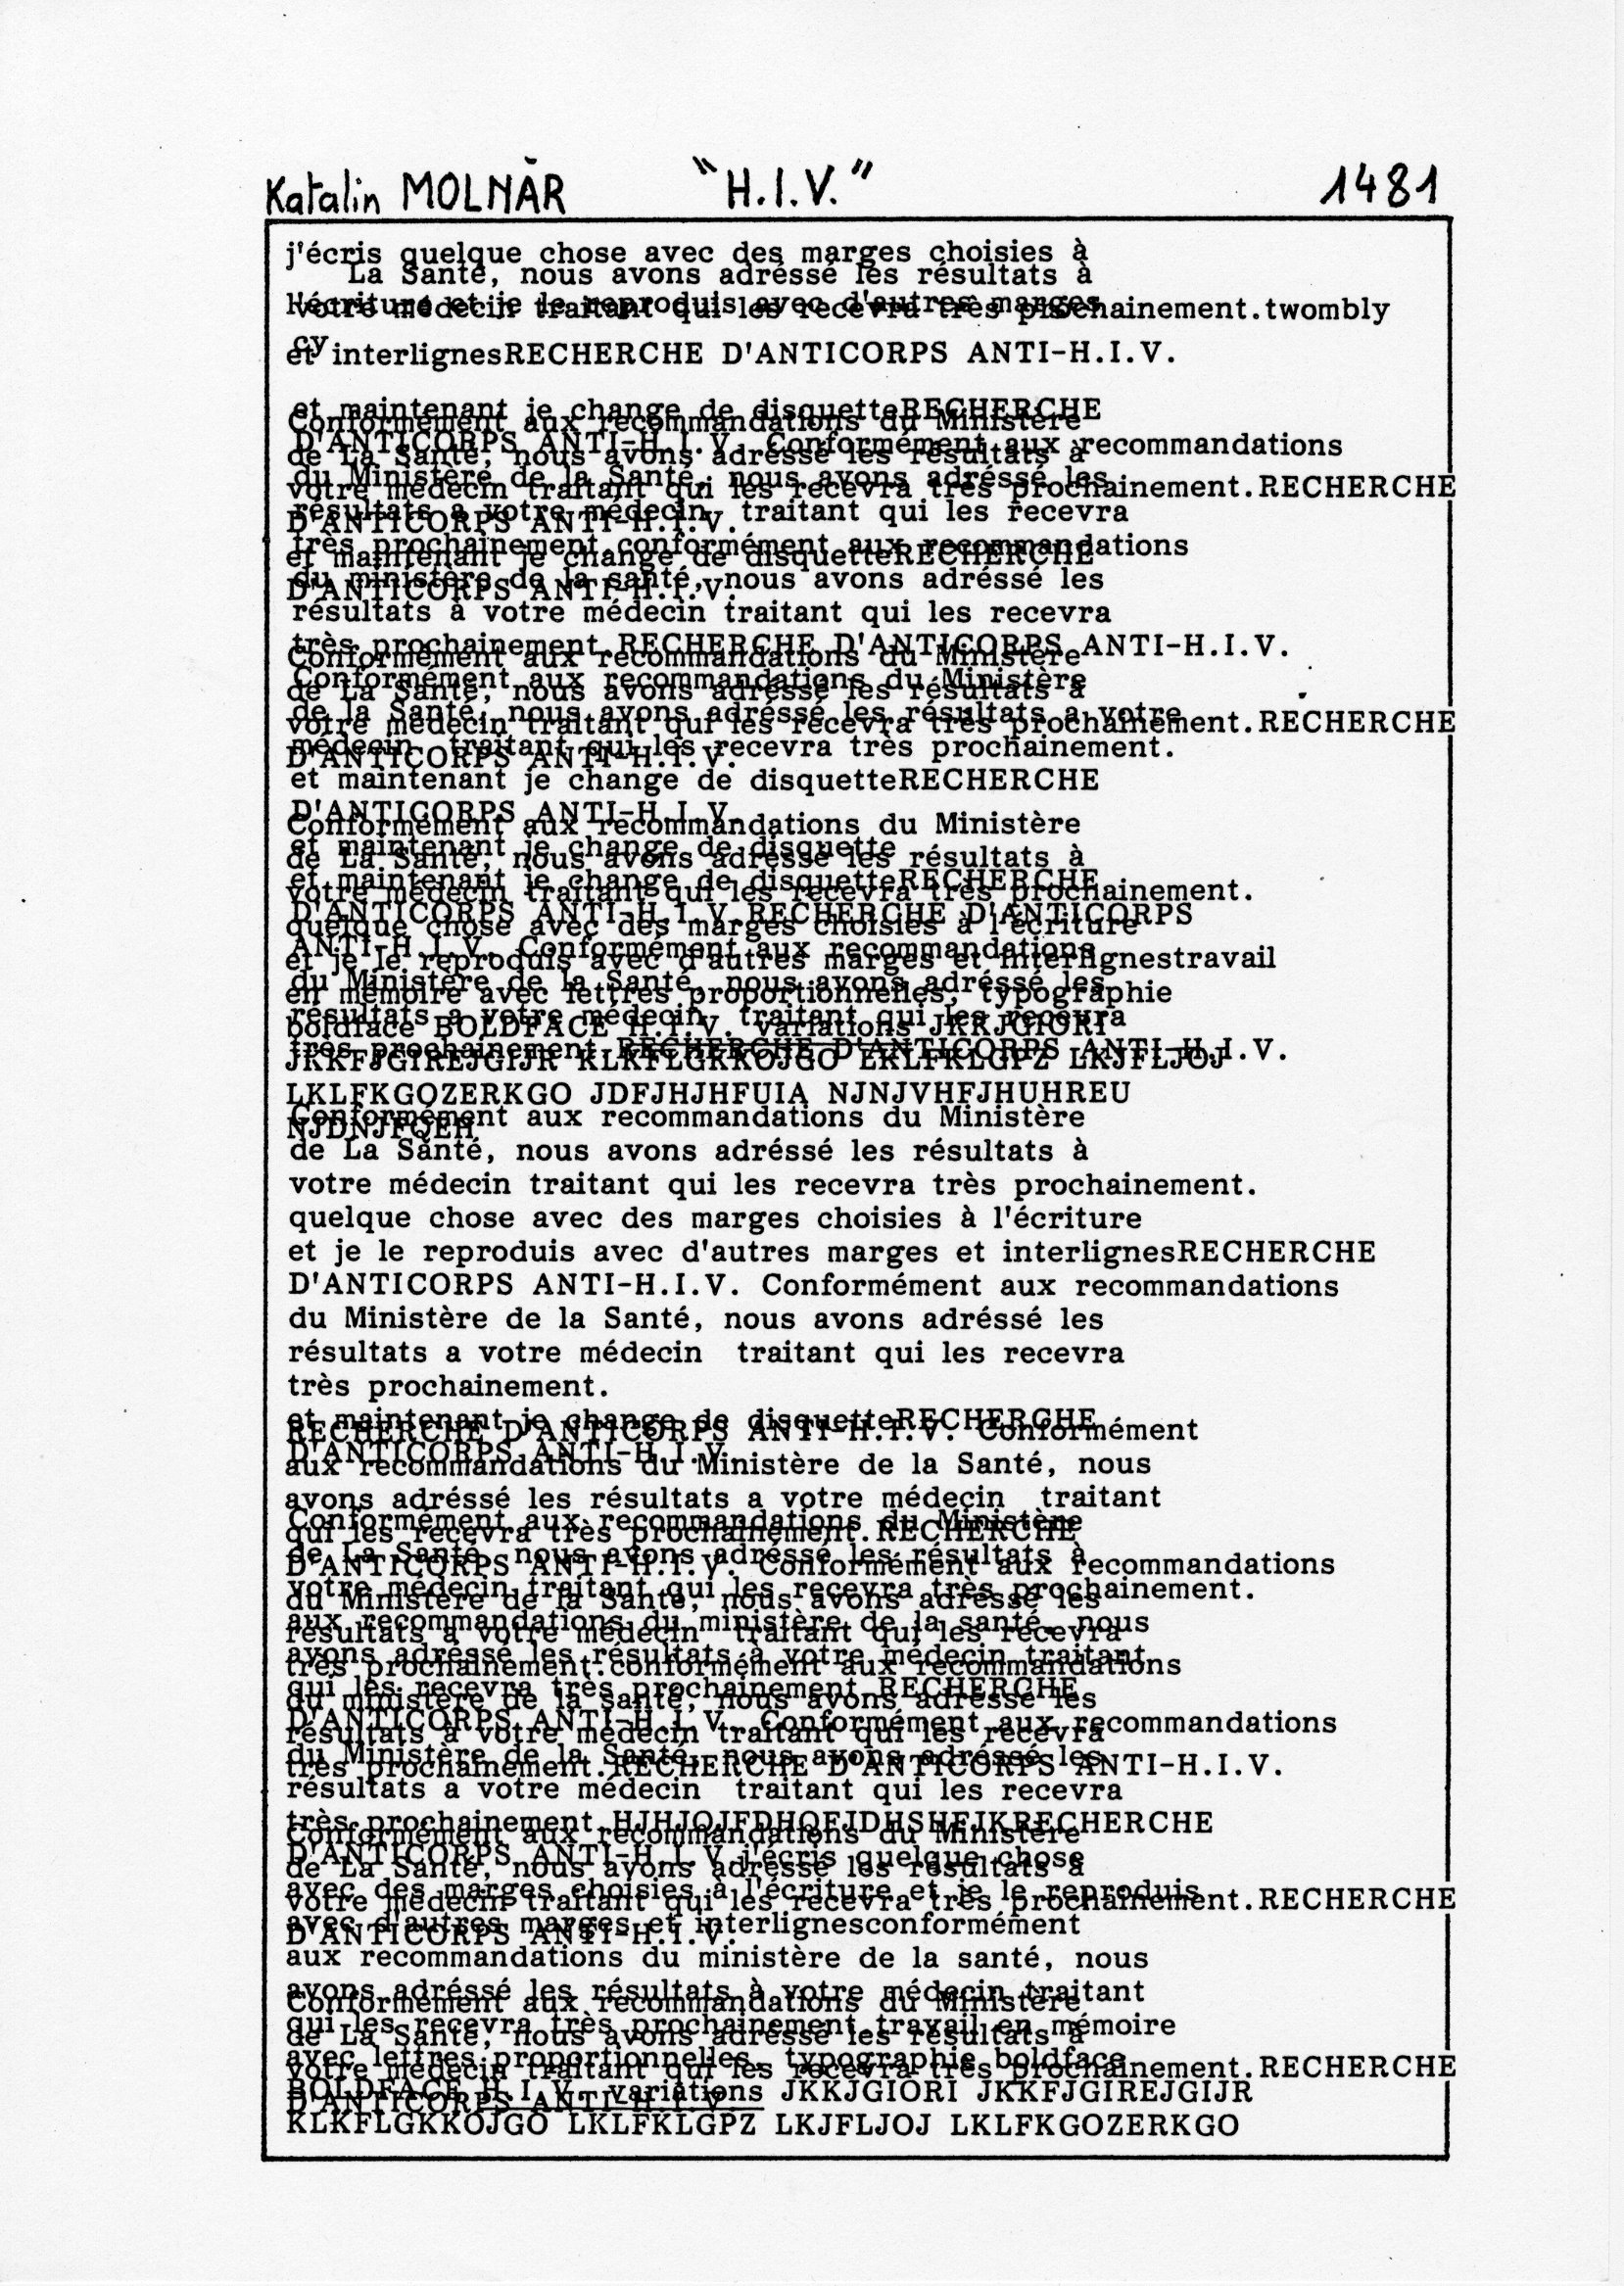 page 1481 K. Molnar H.I.V.